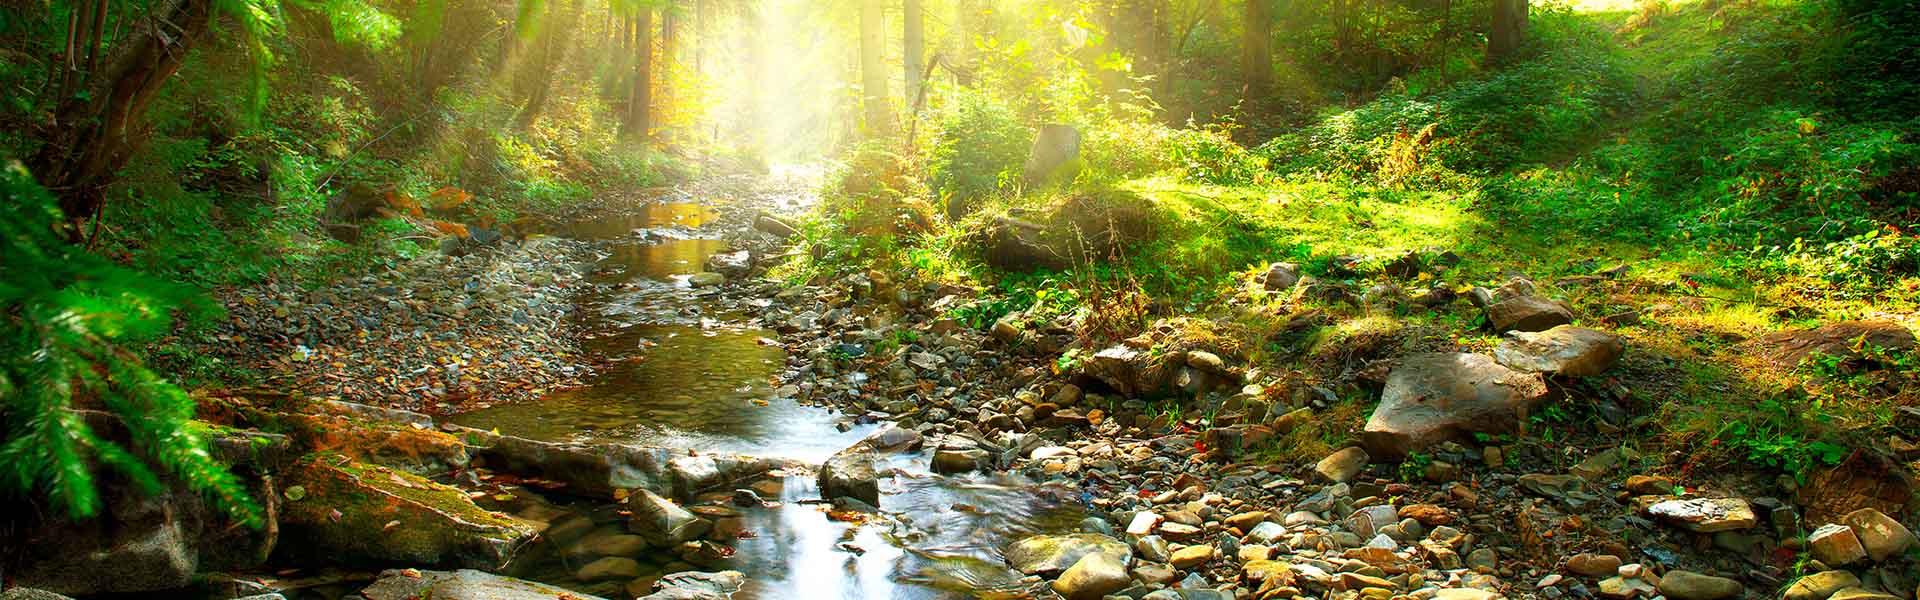 stream in a wood